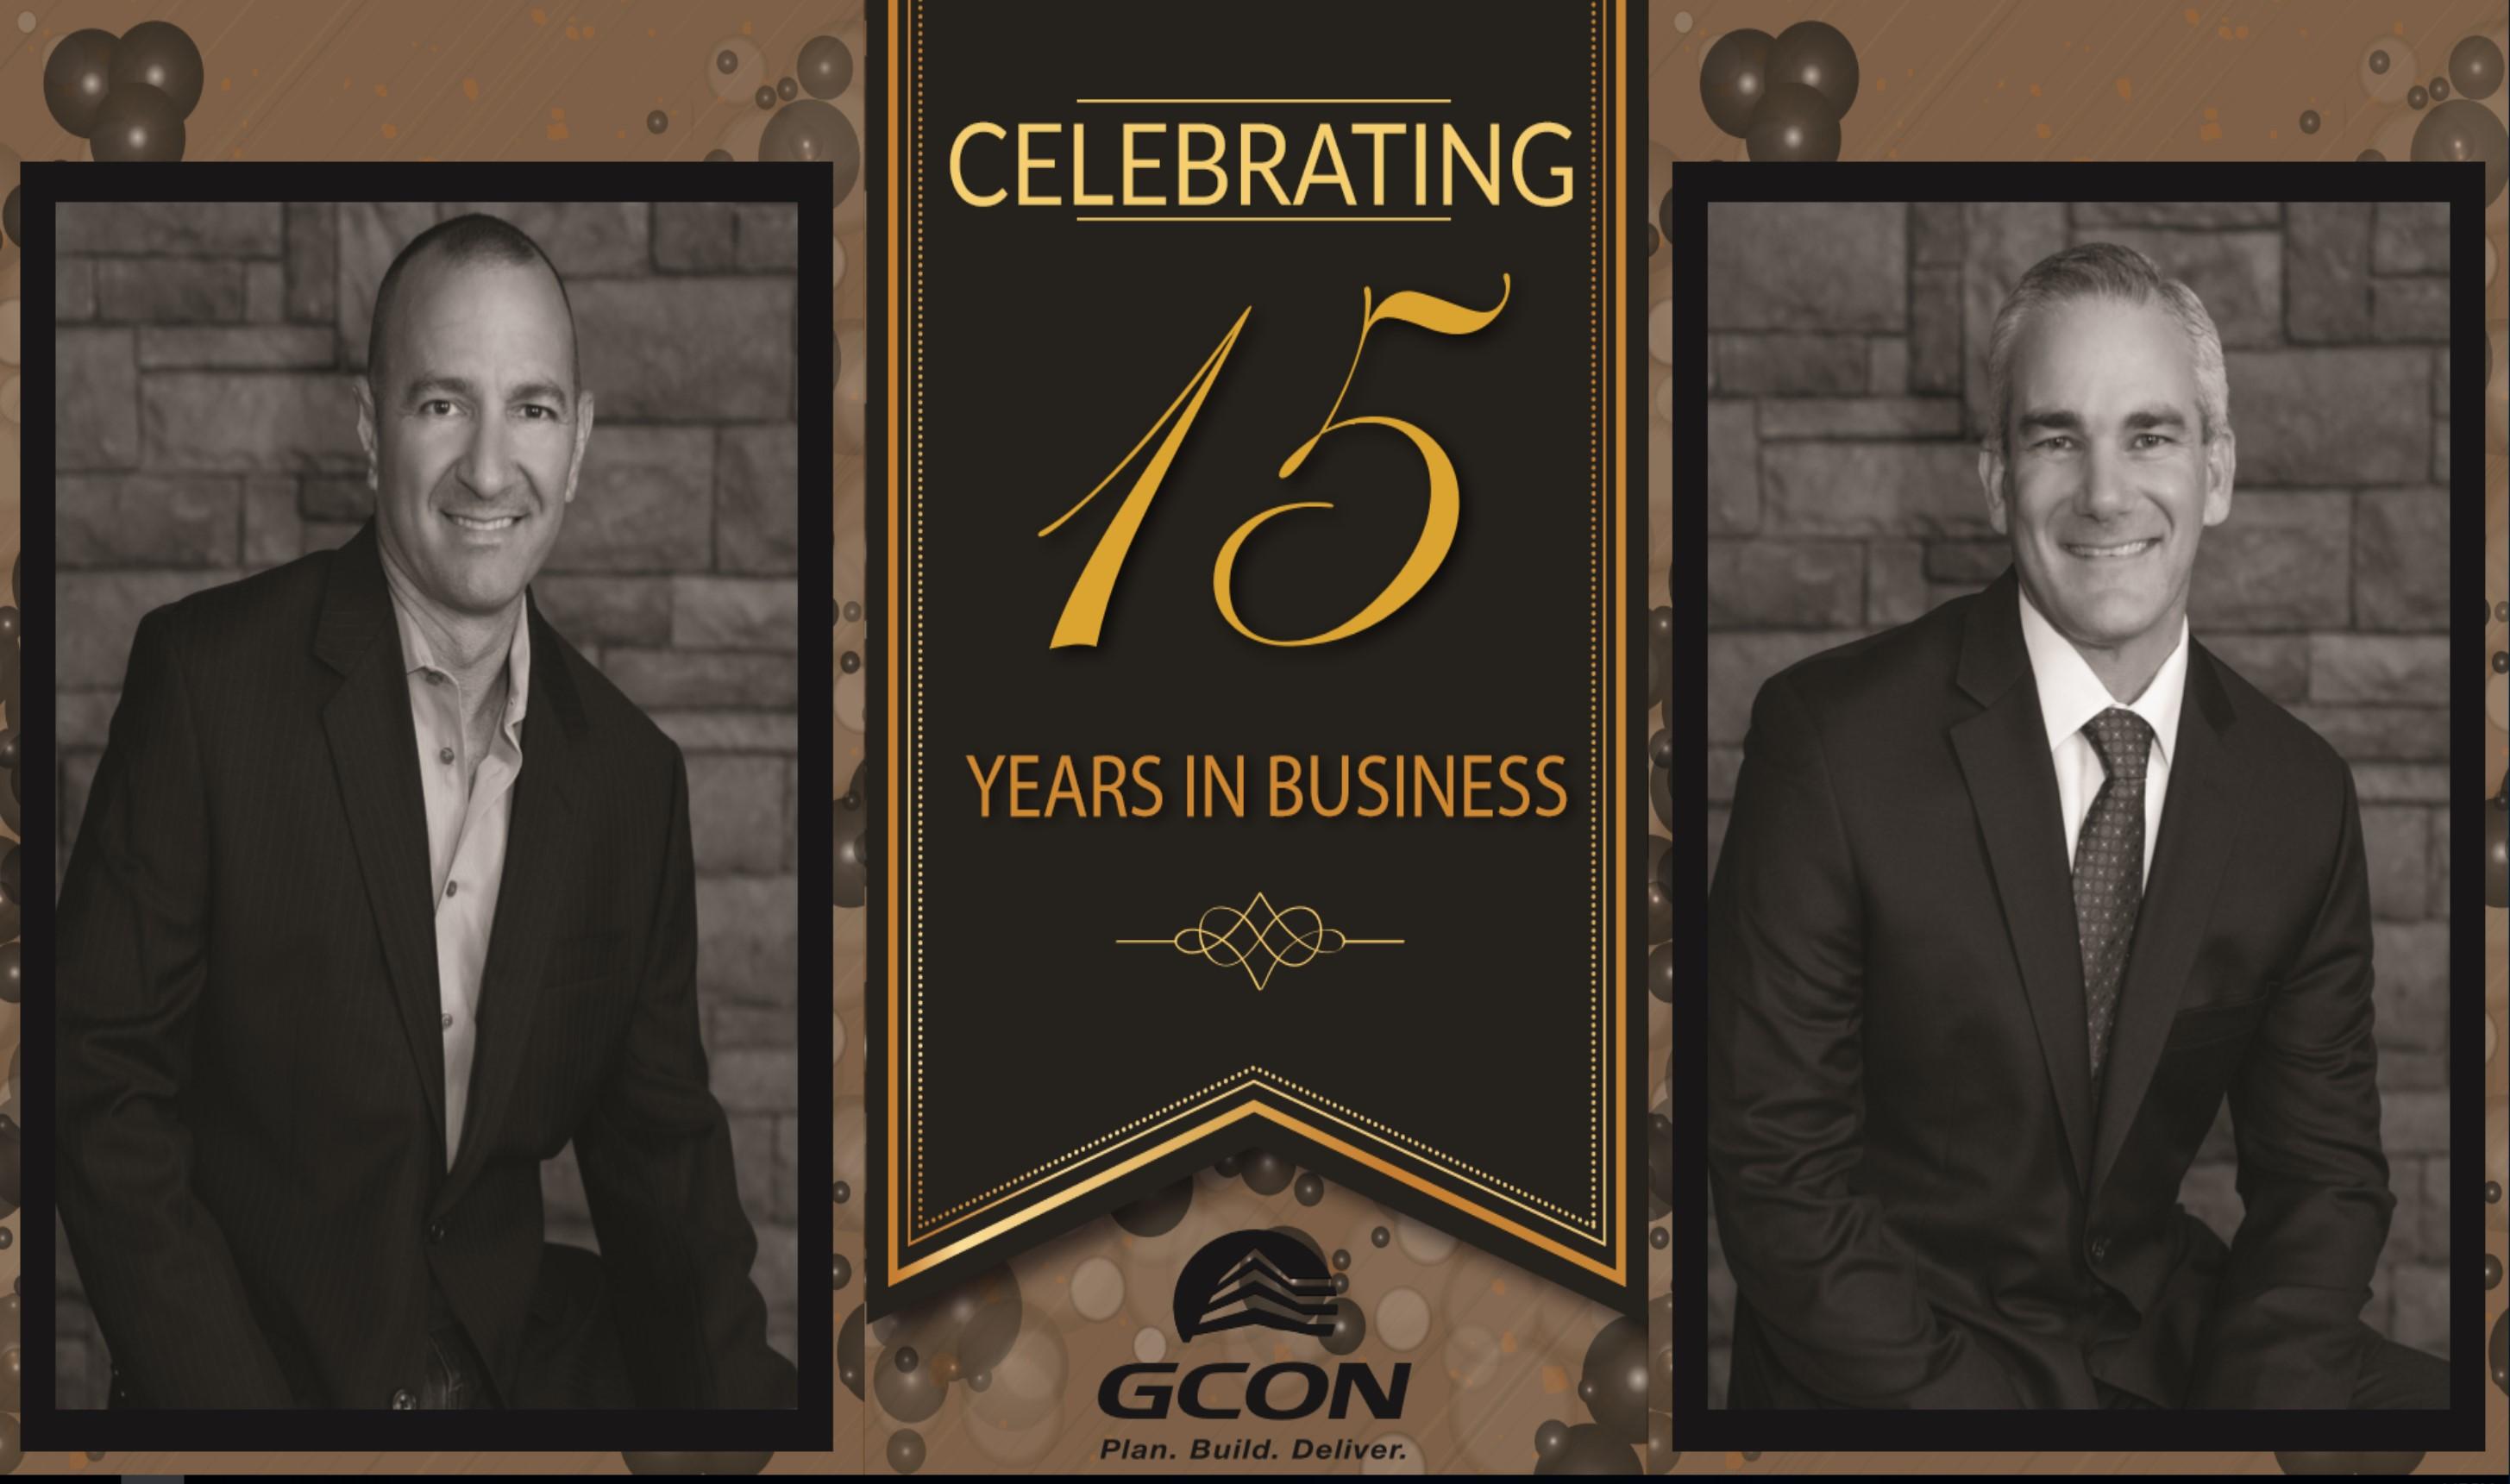 GCON celebrating 15 years